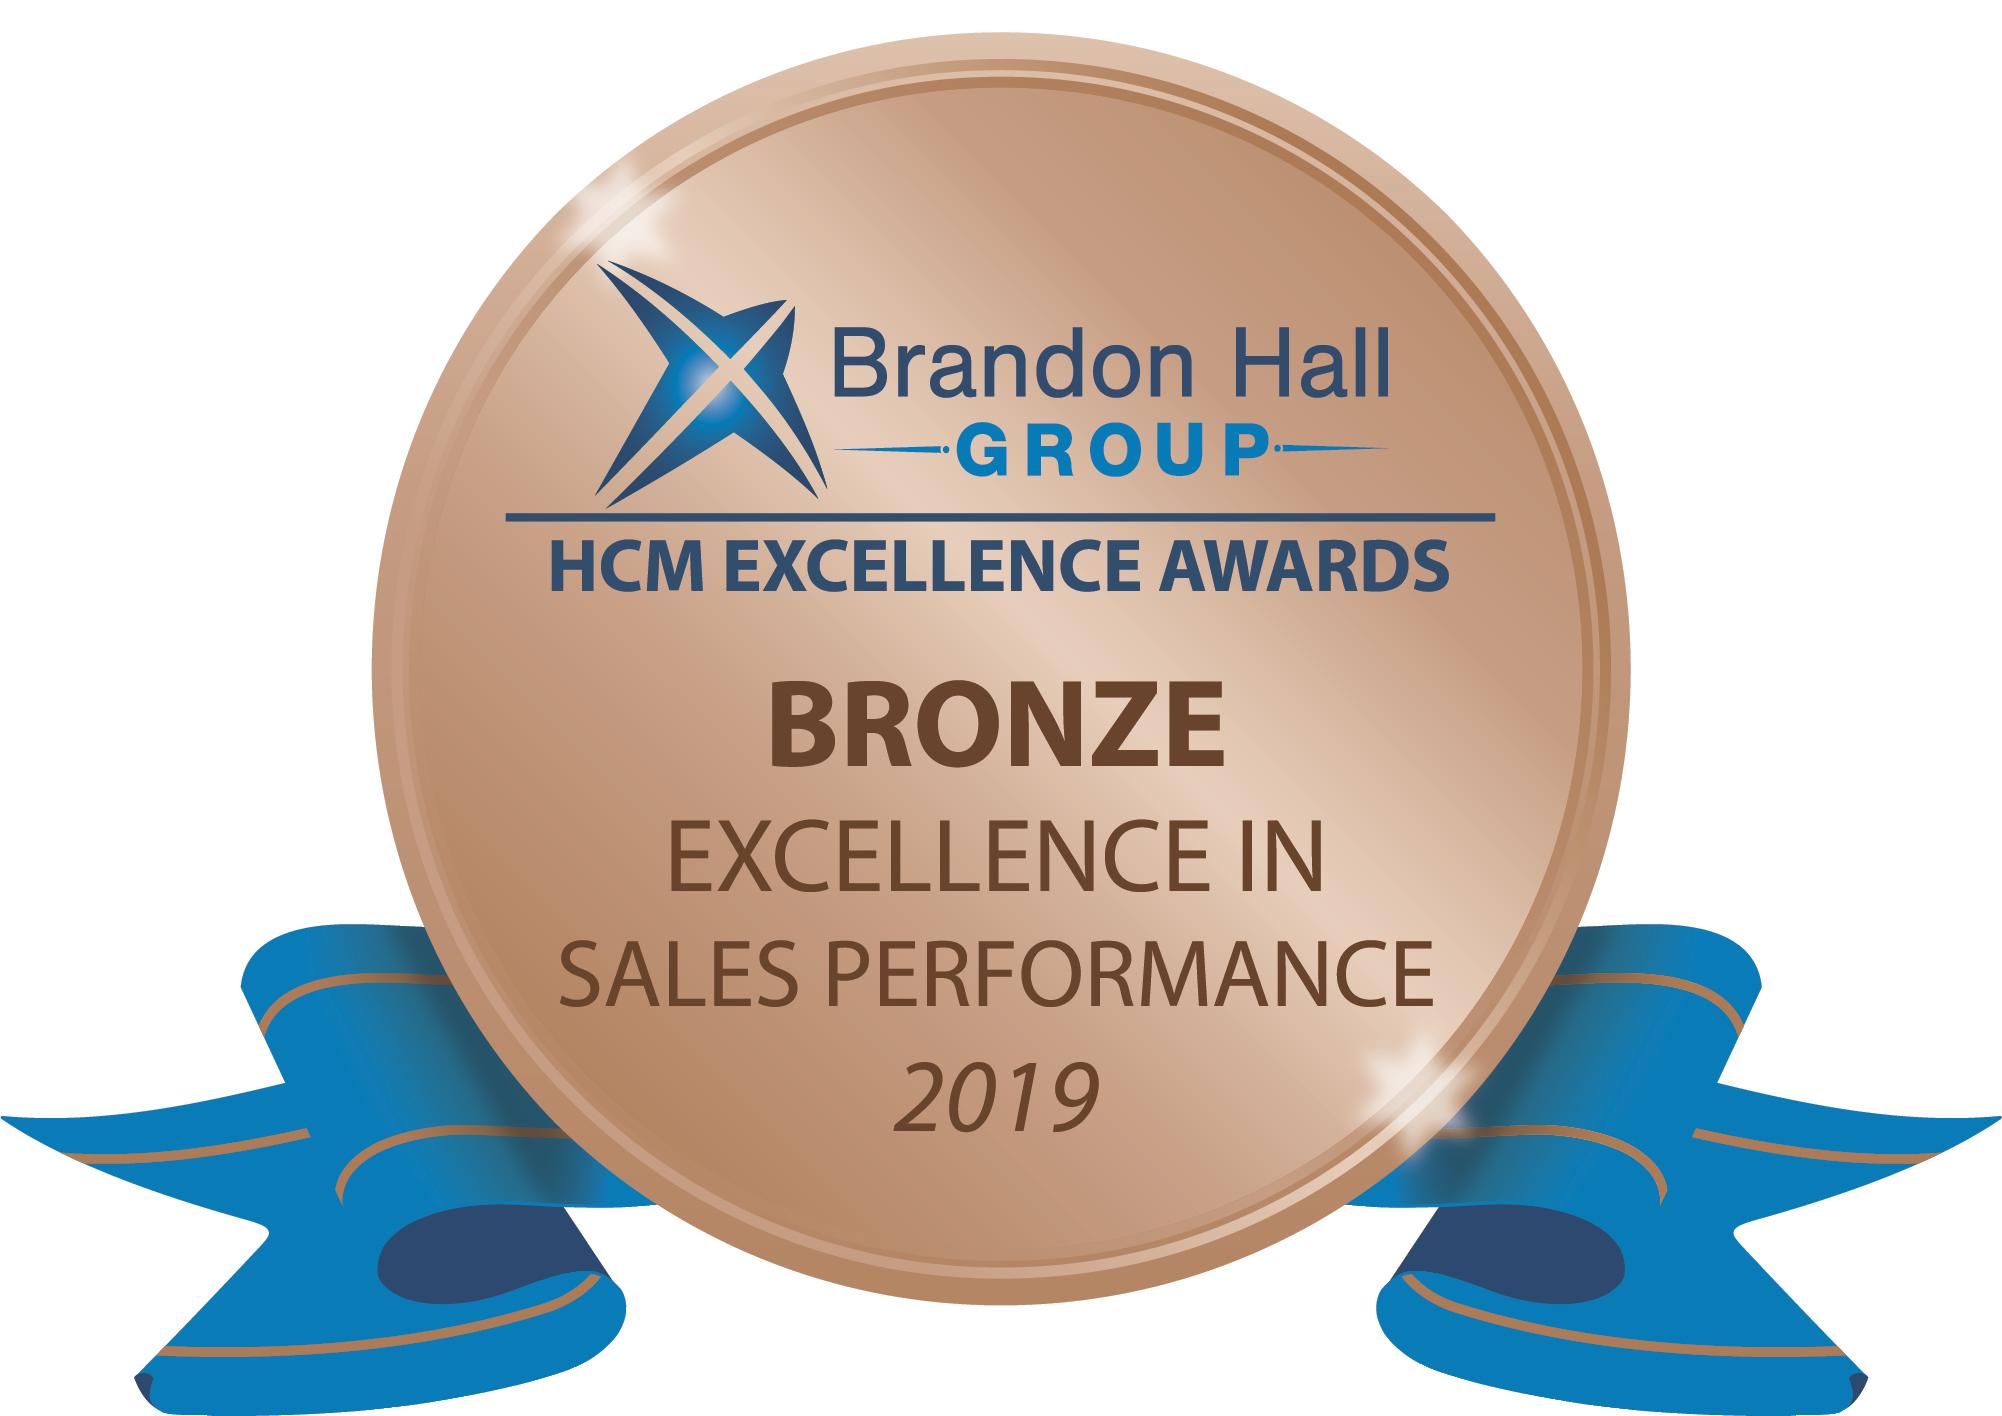 Sales bronze Brandon Hall